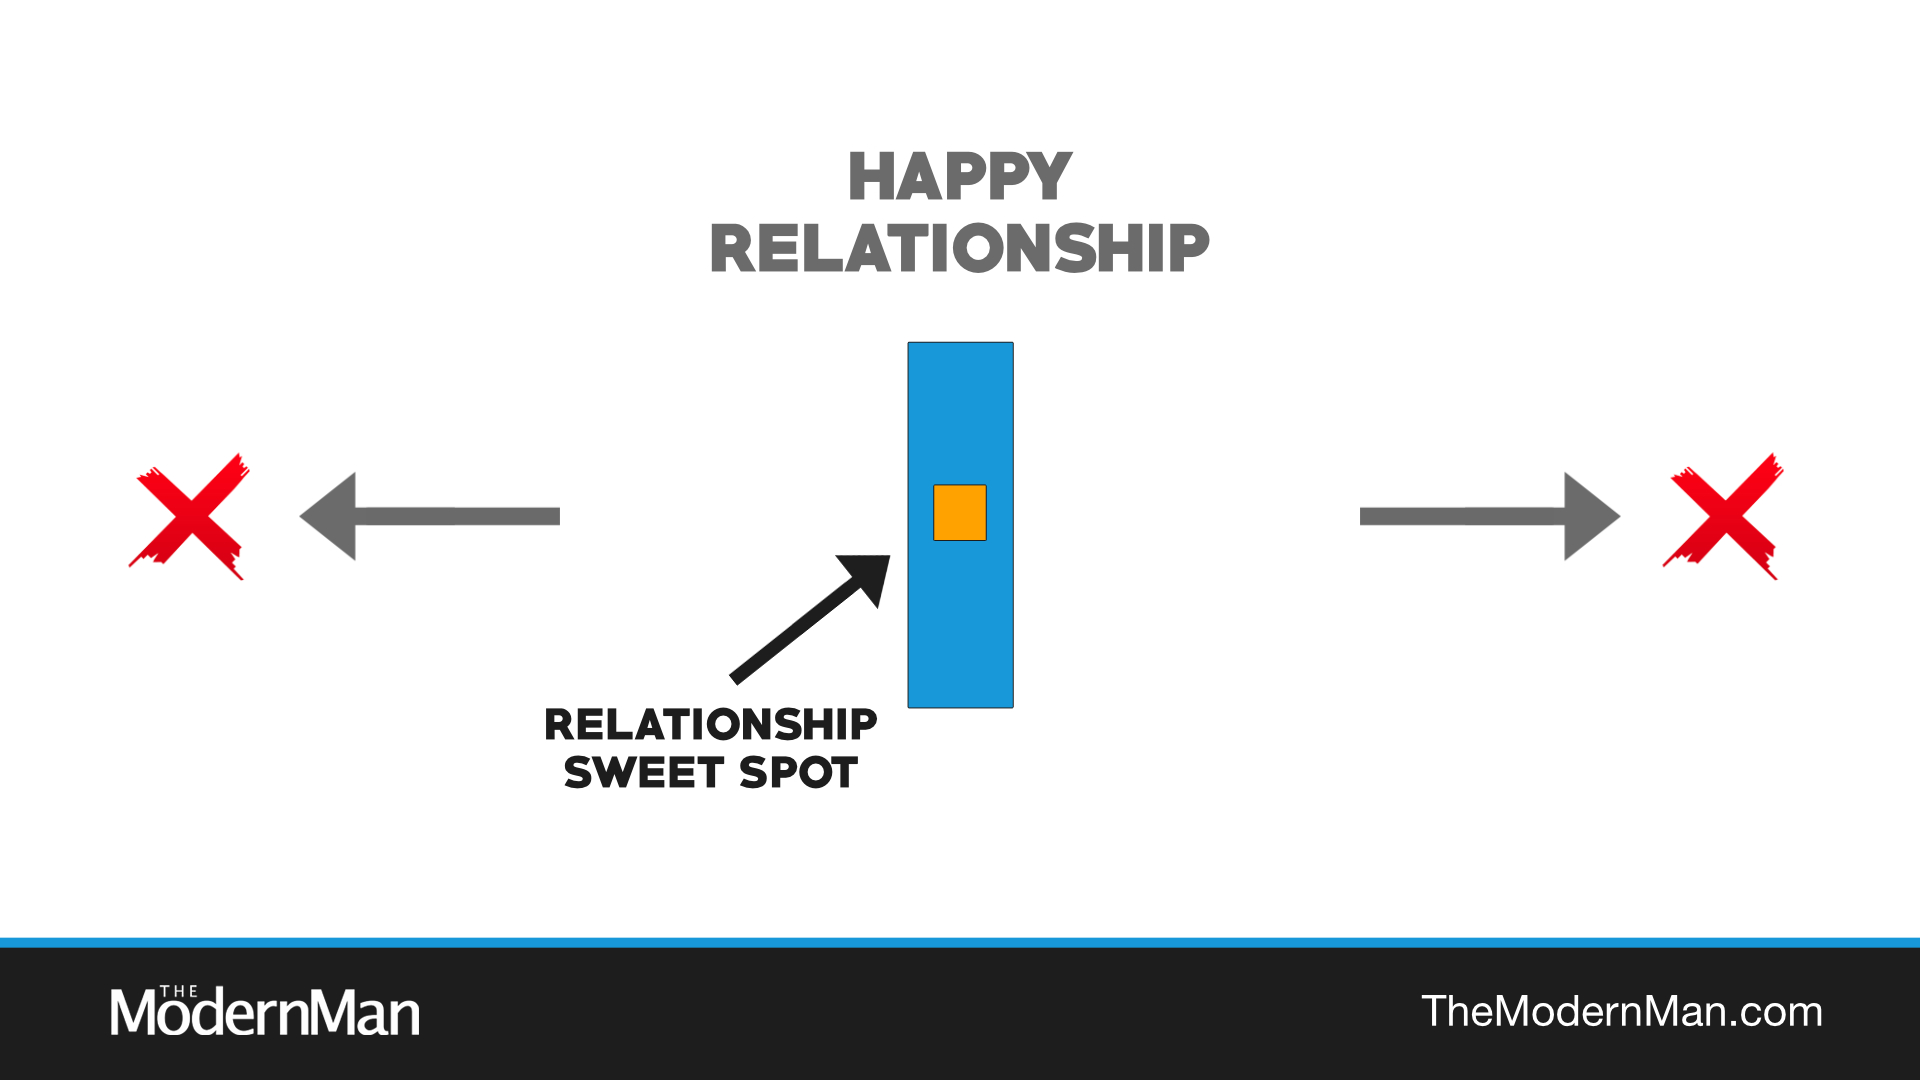 Relationship sweet spot